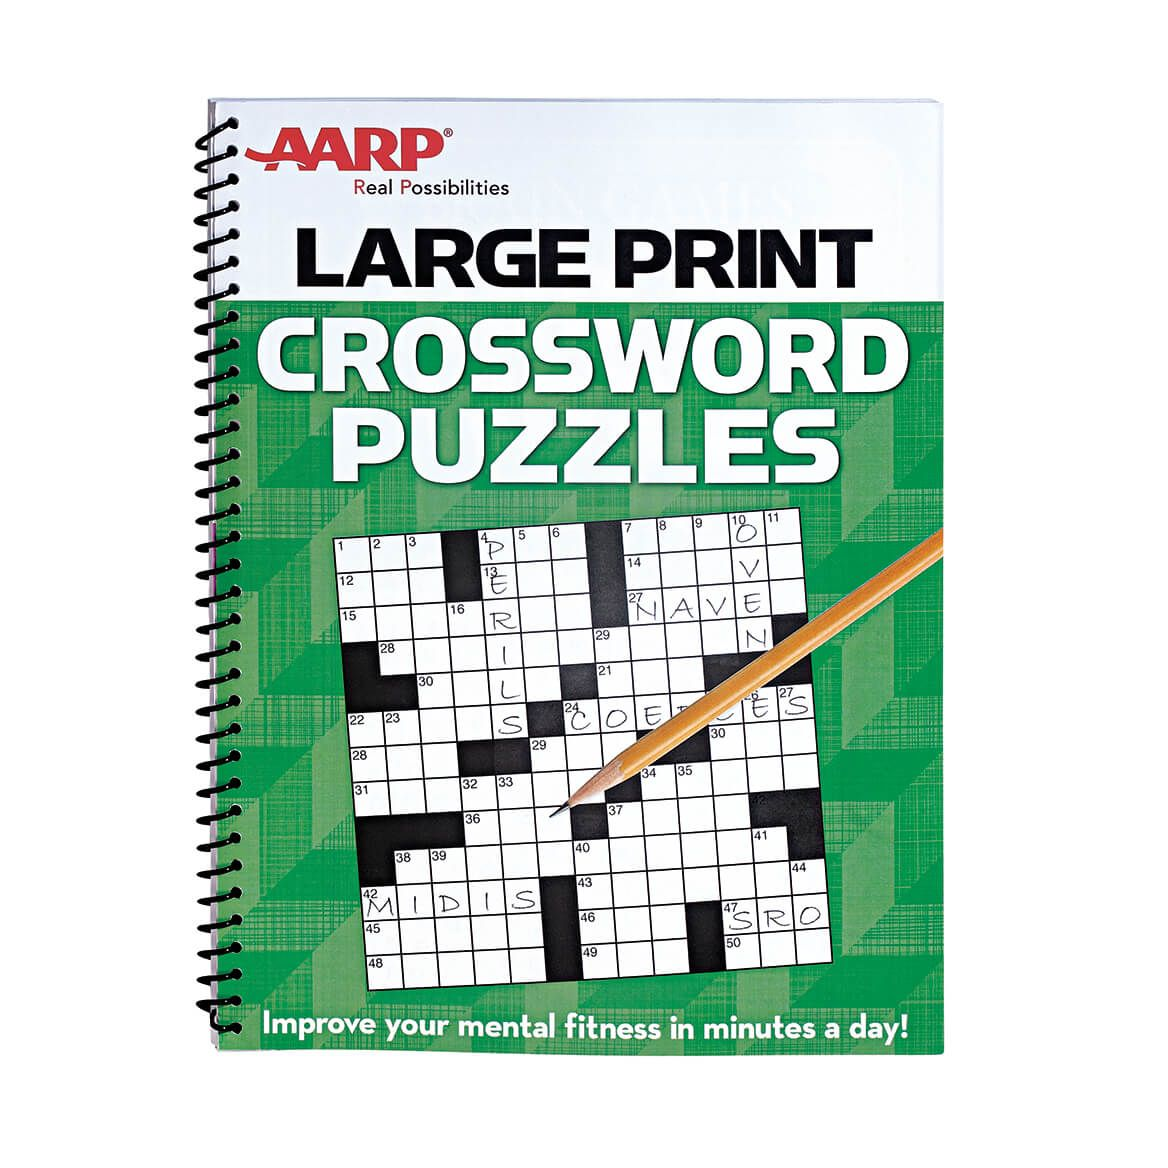 AARP Large Print Crossword Puzzles-351094